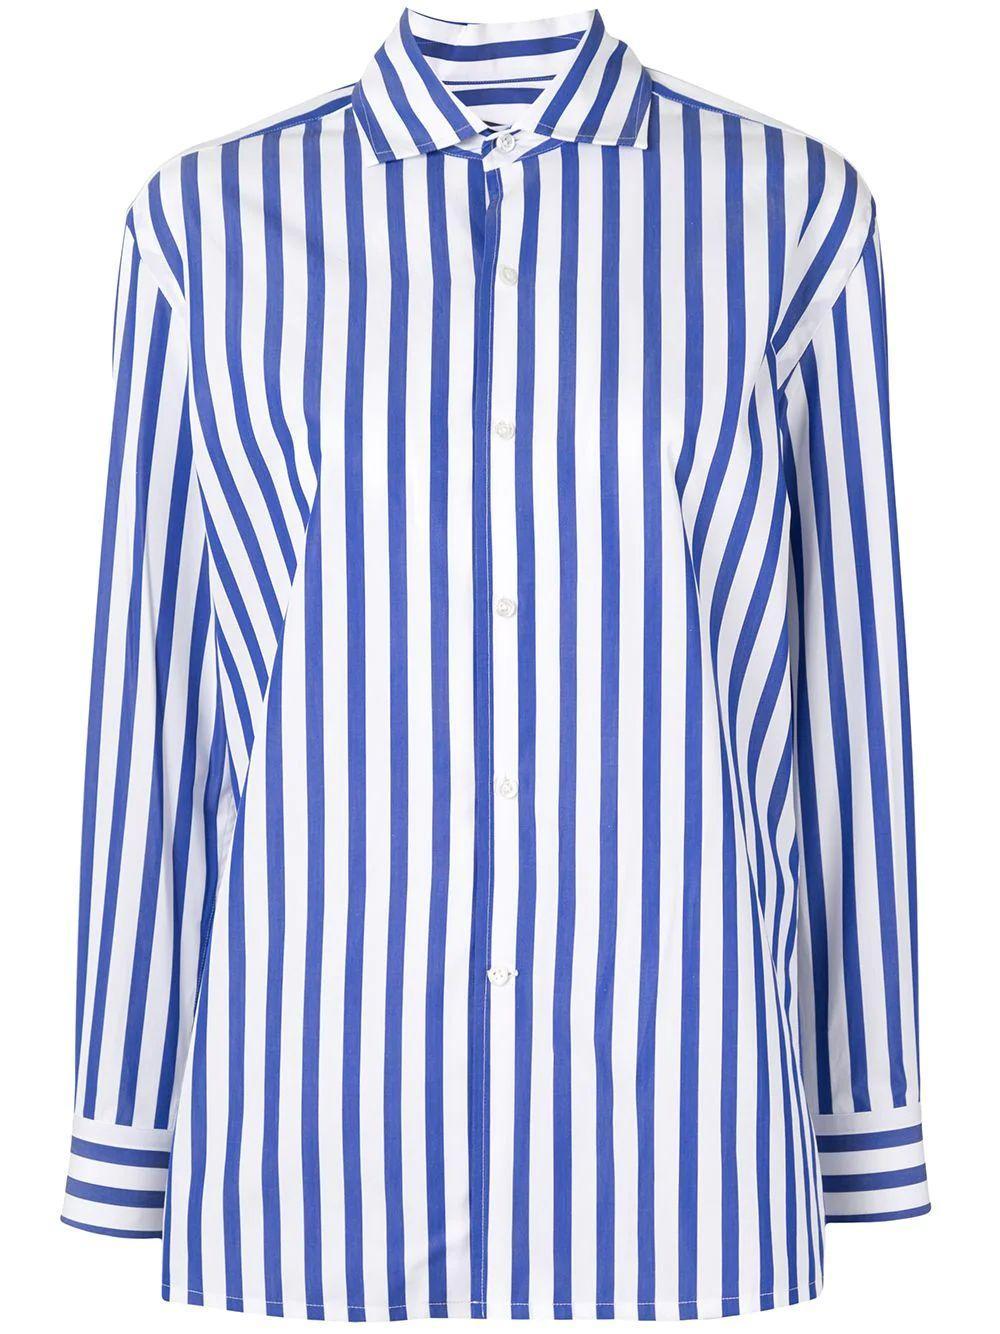 Capri Stripe Button Down Shirt Item # 290649380001-S21